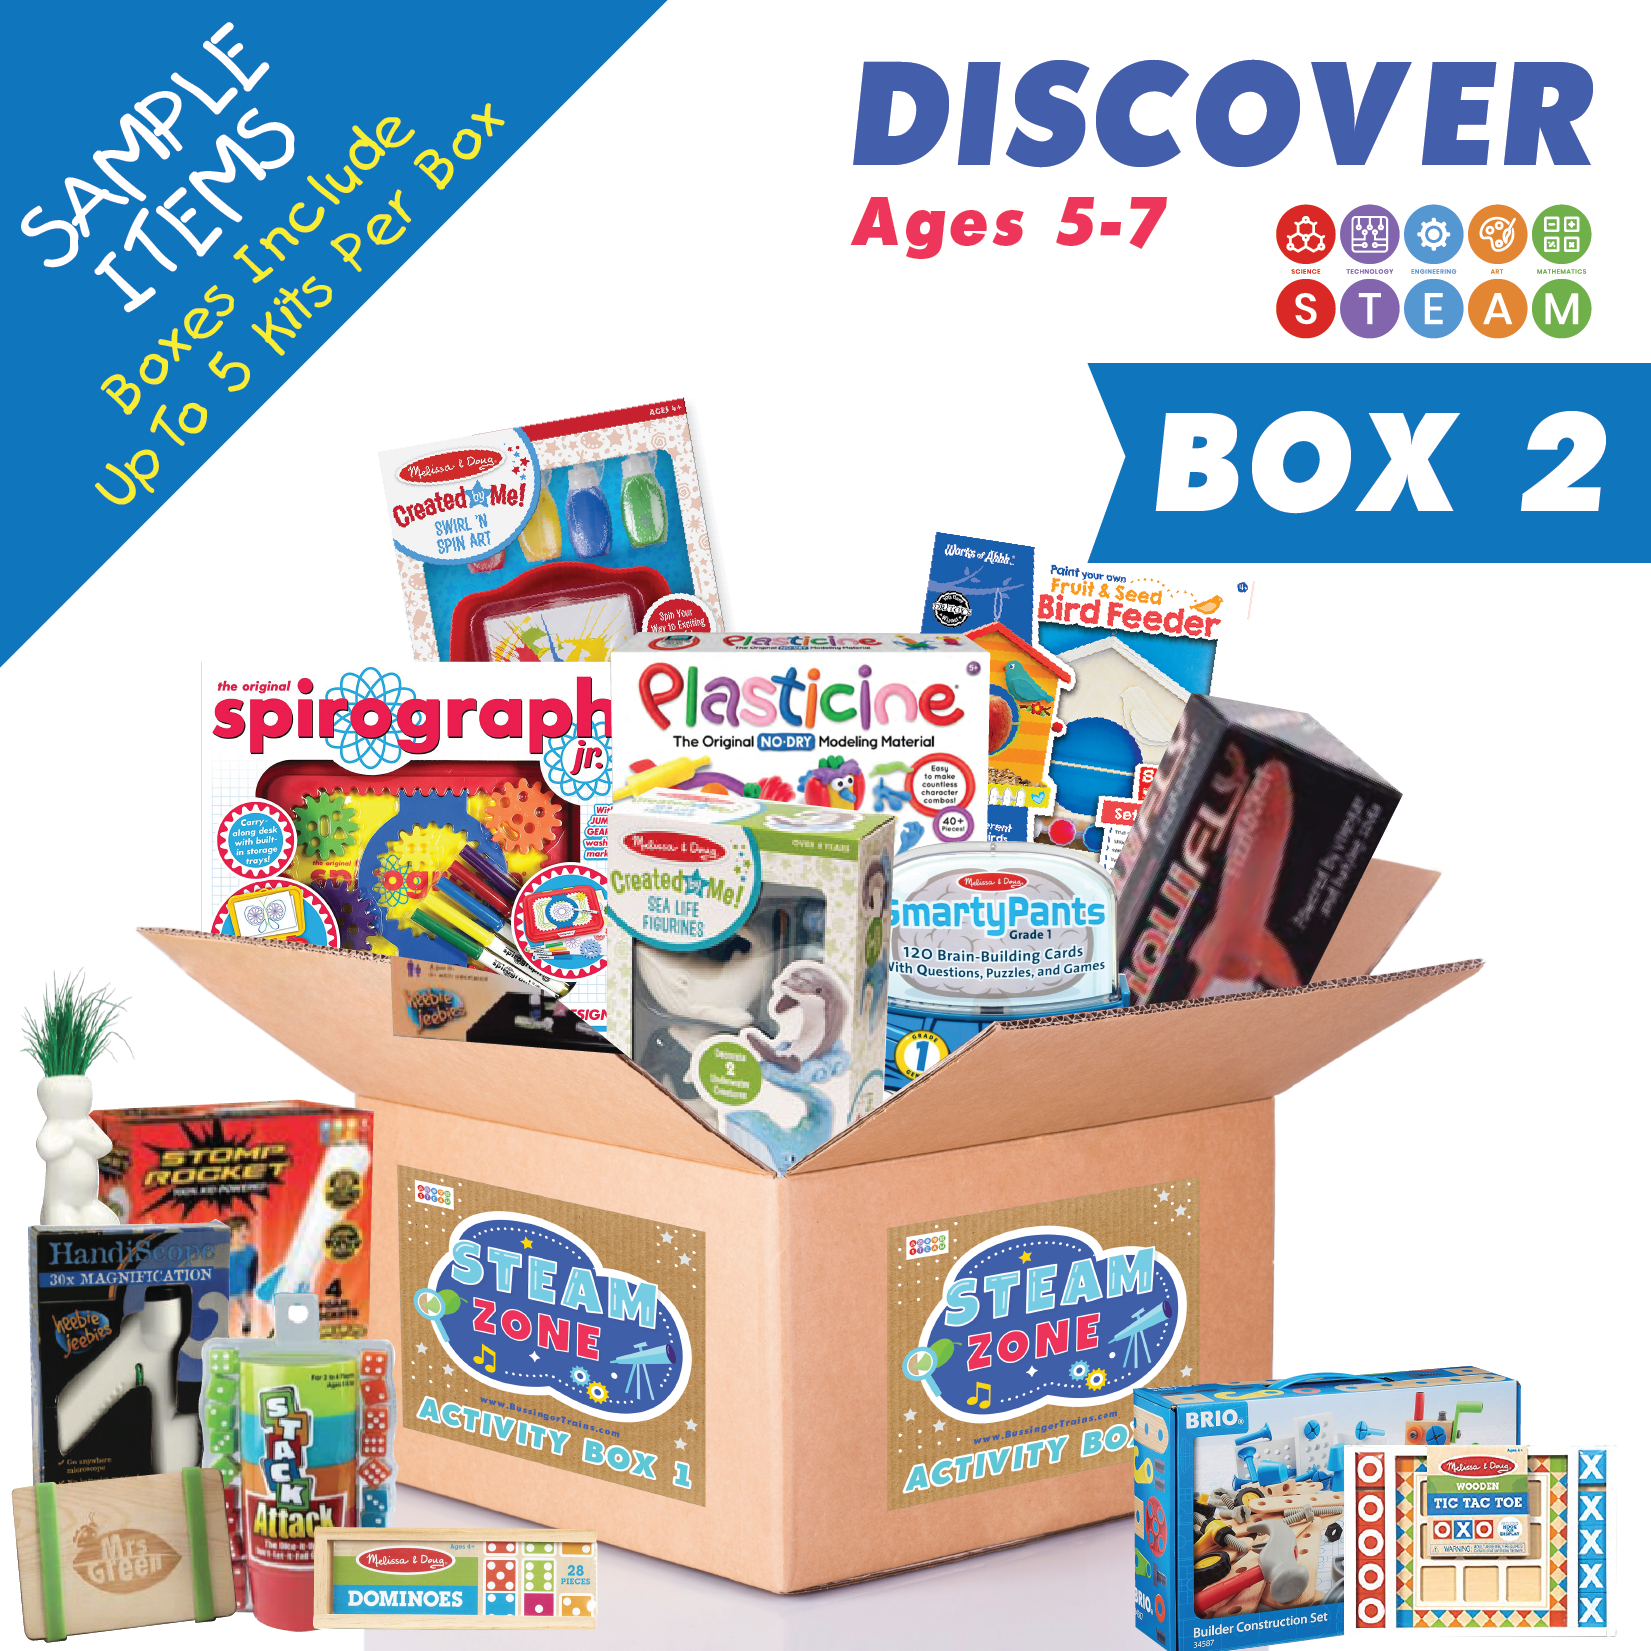 Bussinger Trains S.T.E.A.M Activity Kit Box - Two